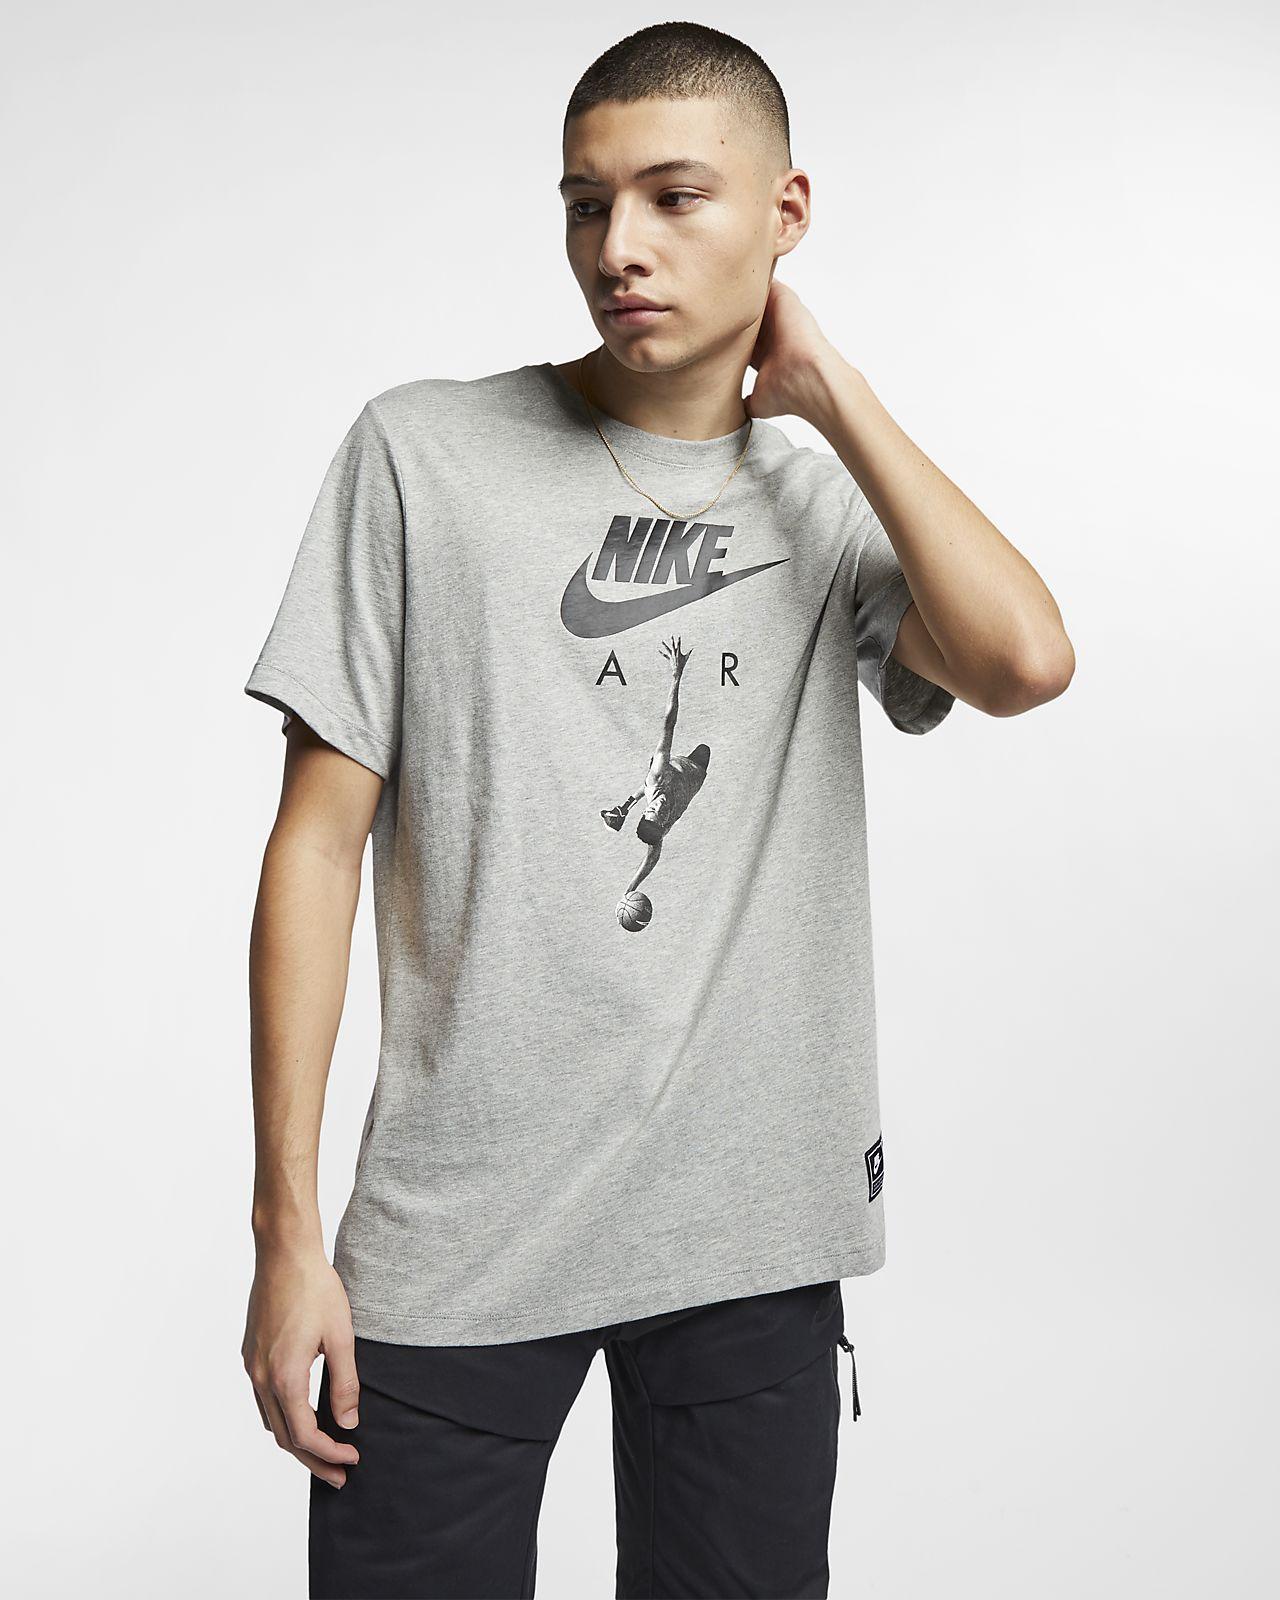 T-shirt Nike Air - Uomo